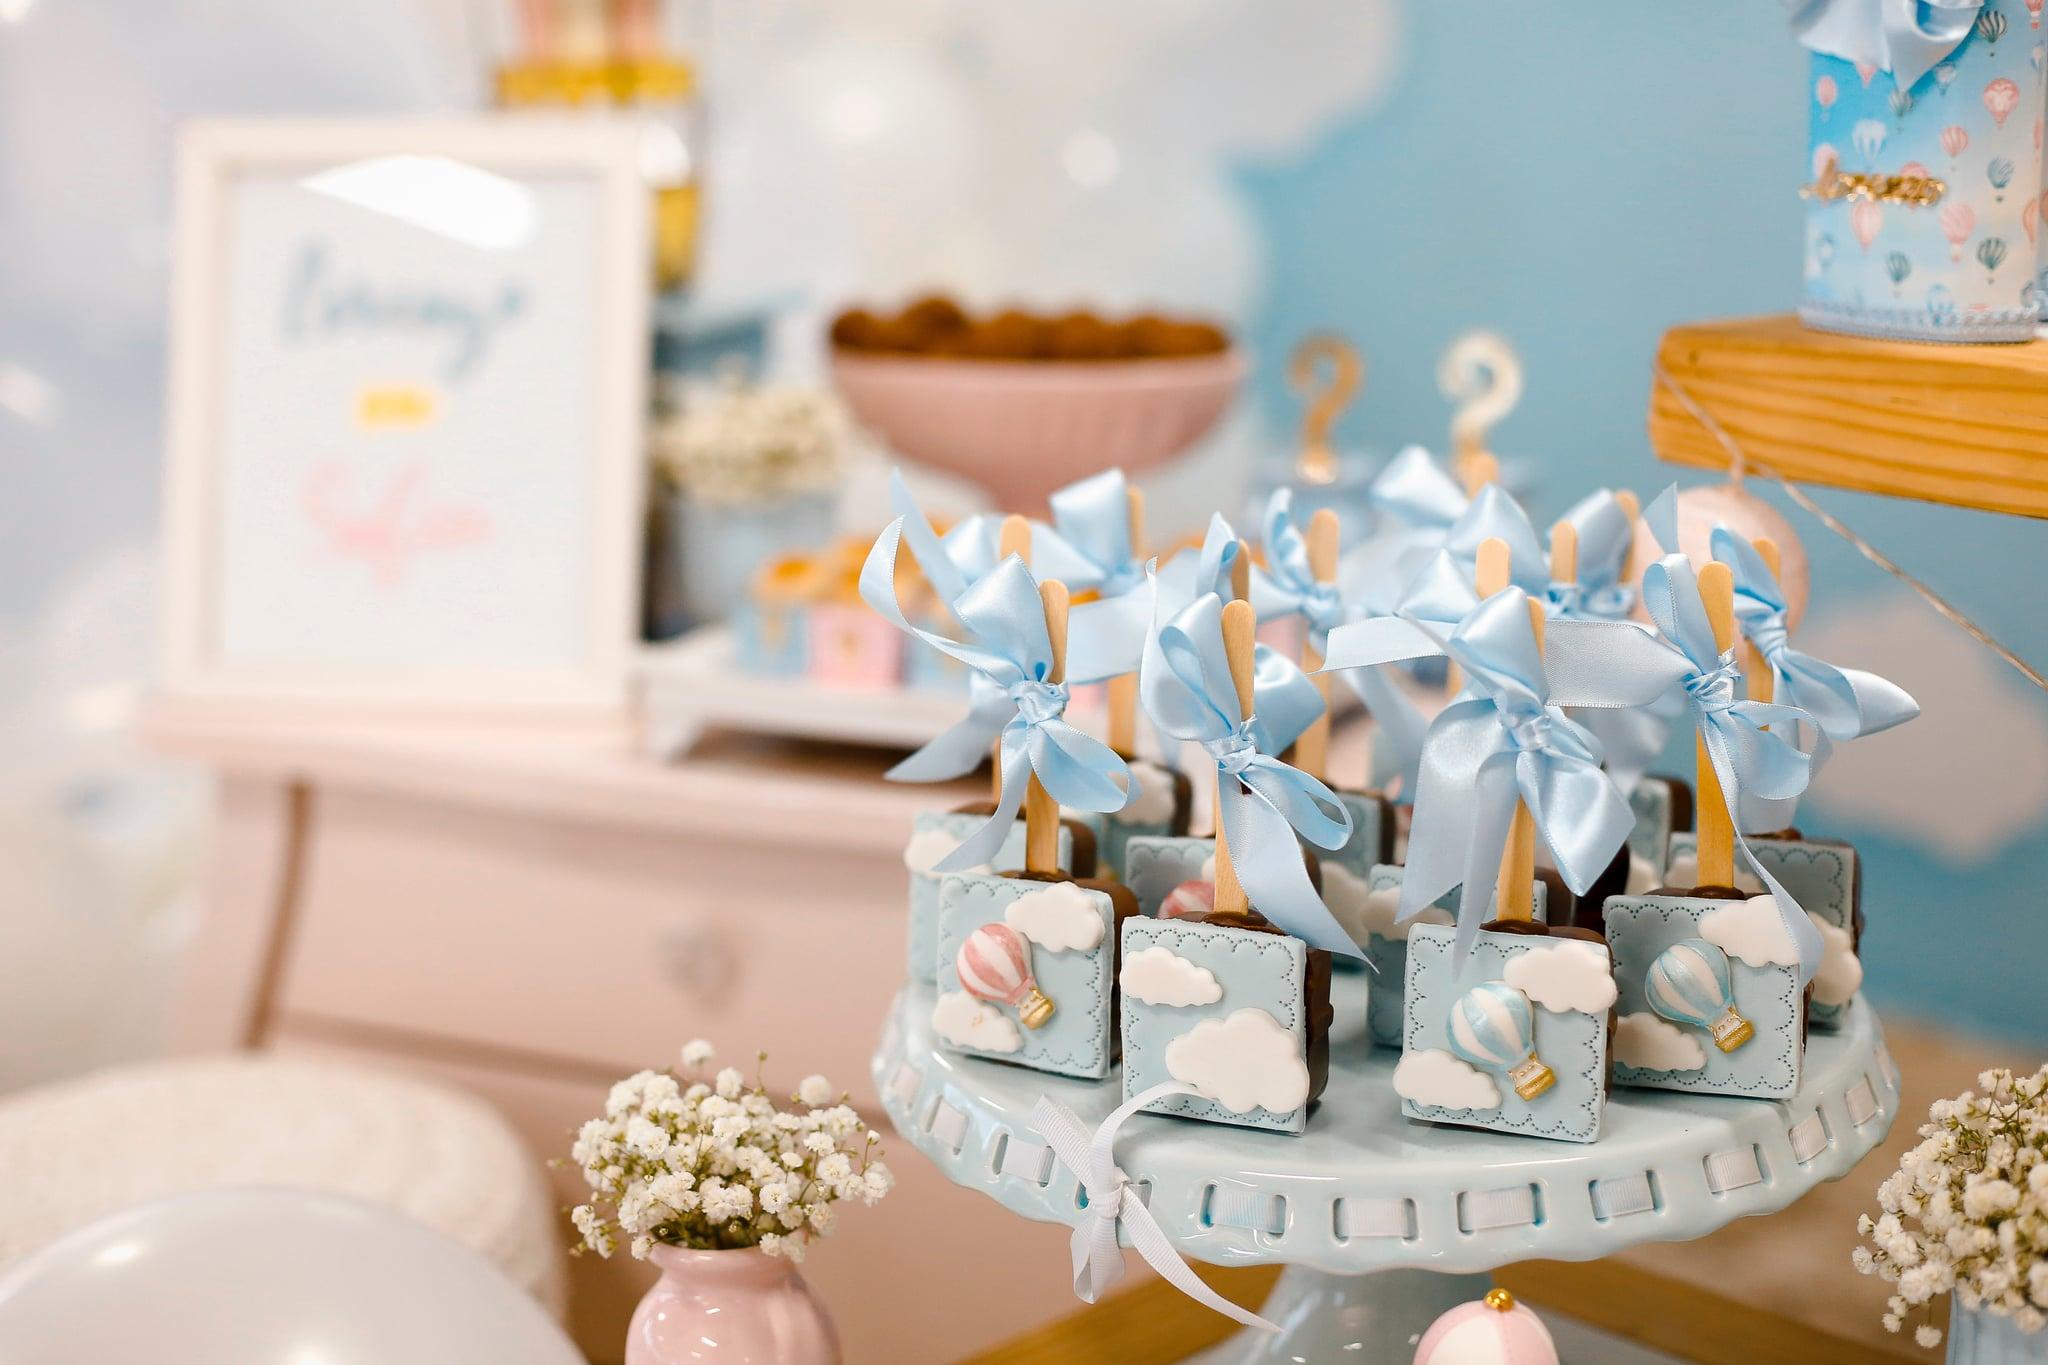 tmp 1HRBhc 2362901dd41b5733 art baby shower cake 1682462